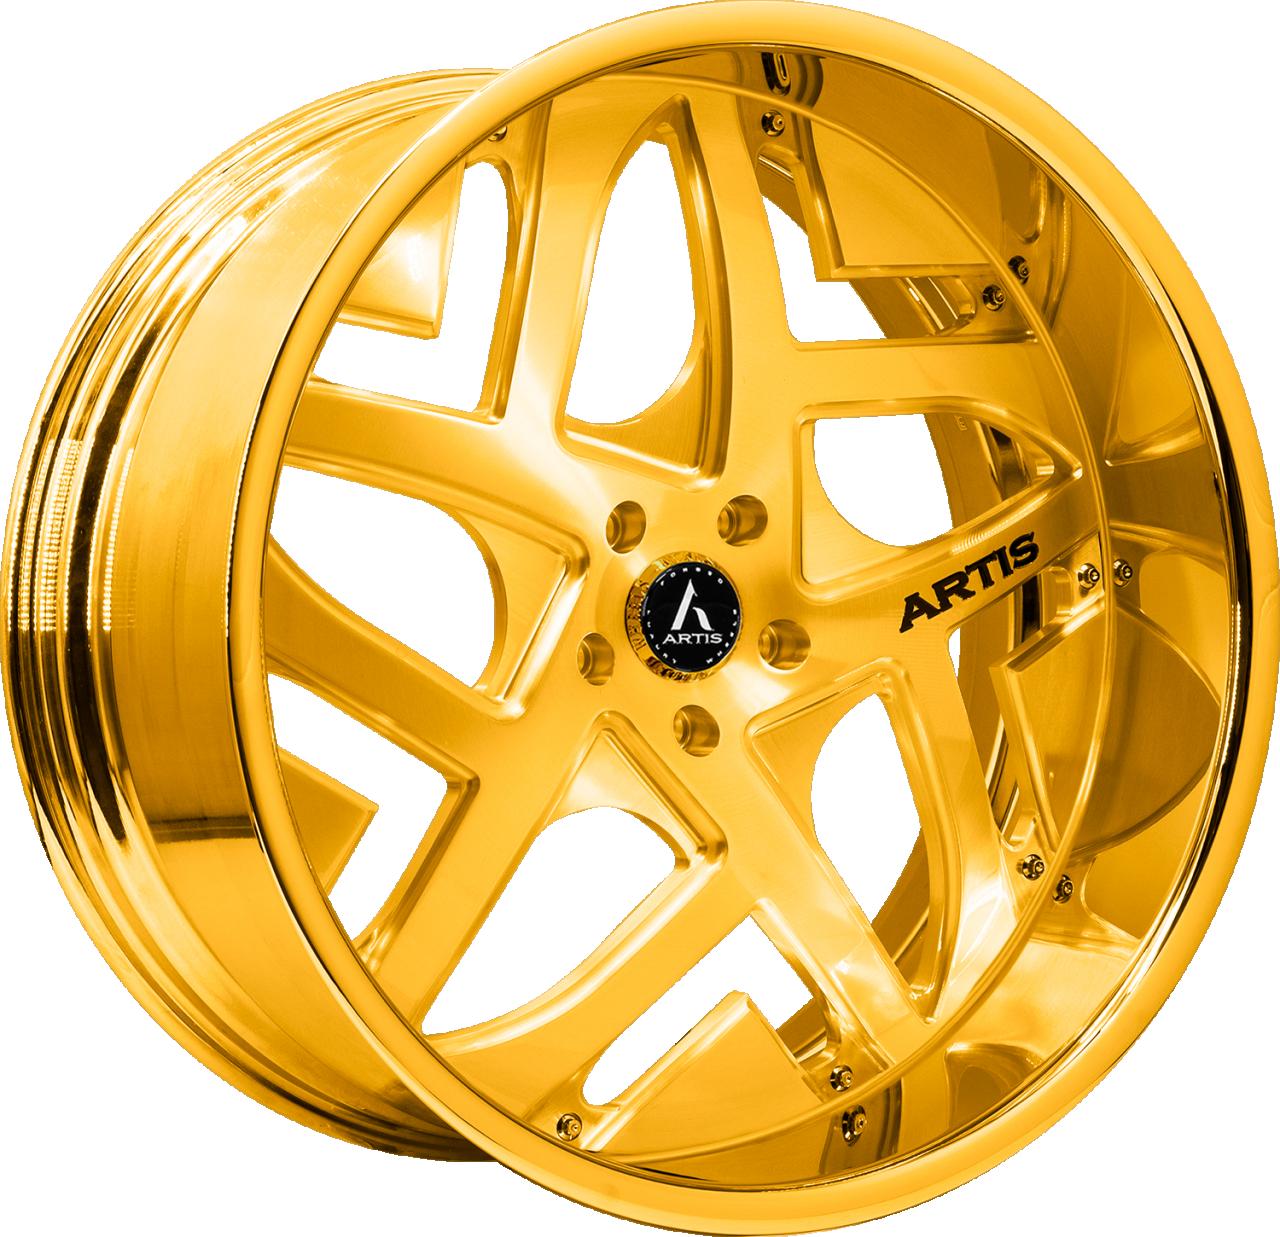 Artis Forged Pueblo-M wheel with Gold finish